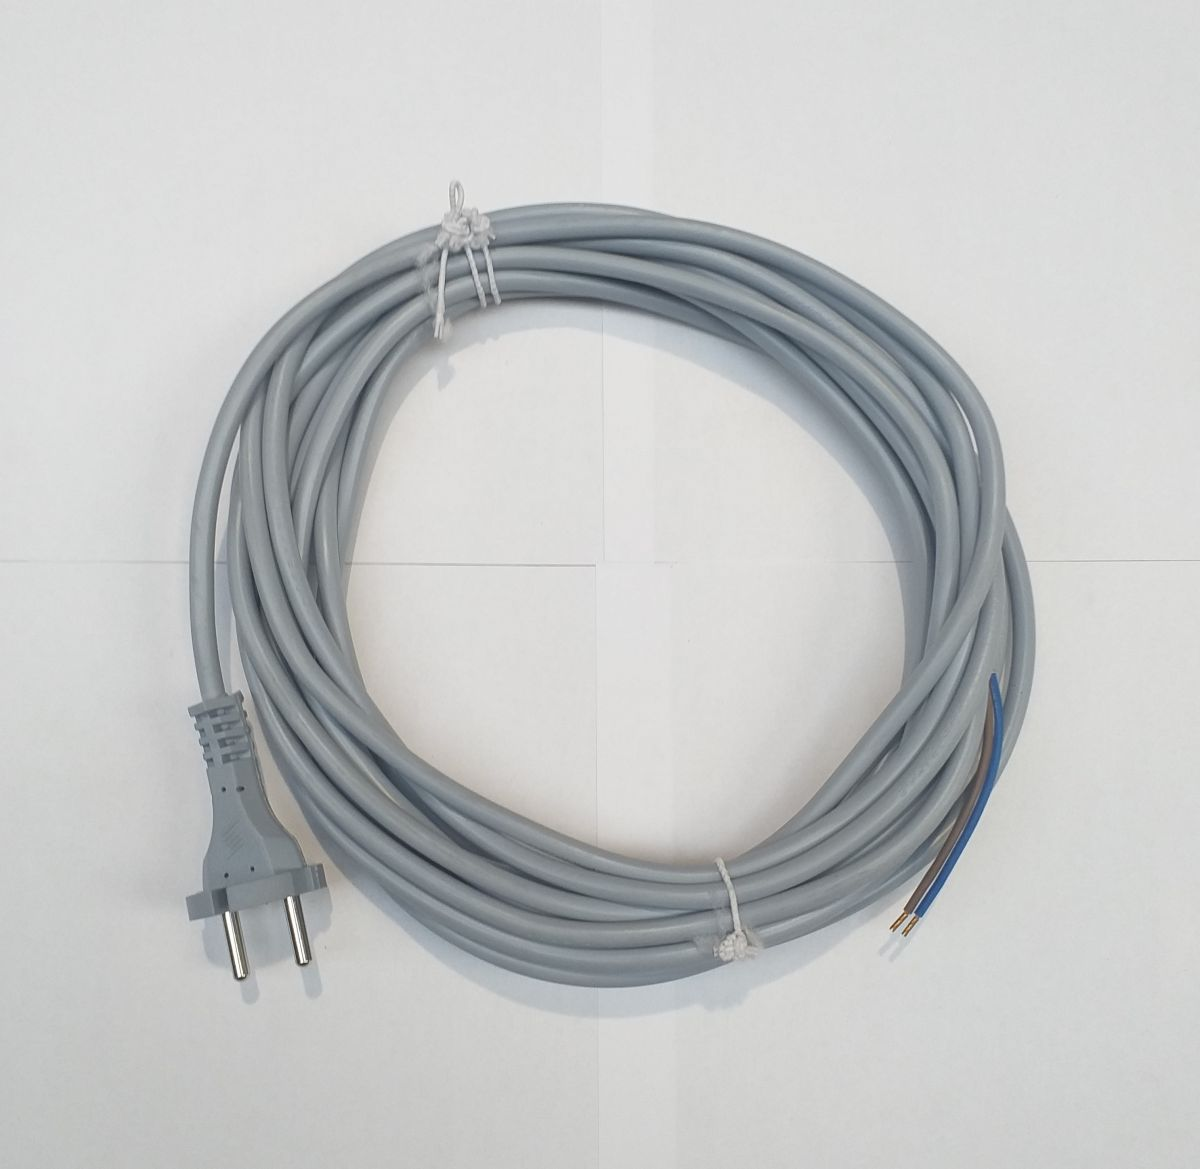 kabel 2 x 1,0 šedý 7,5m